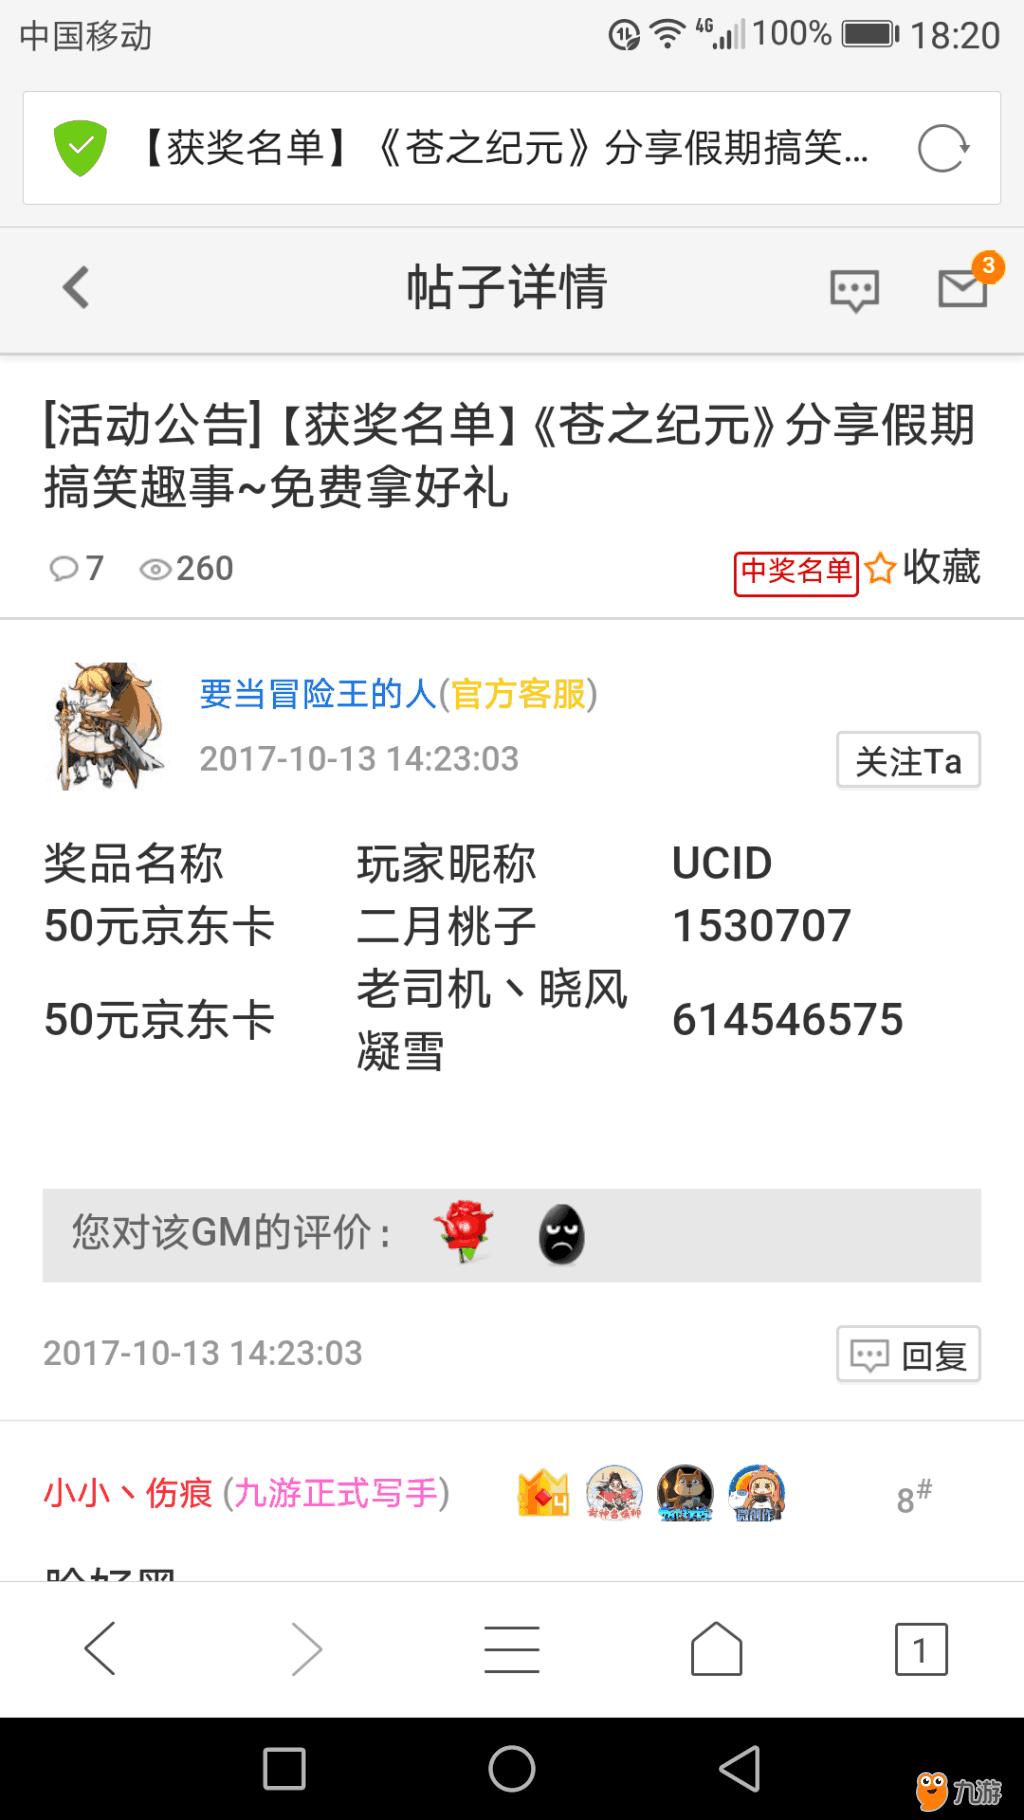 Screenshot_20171013s182006.png